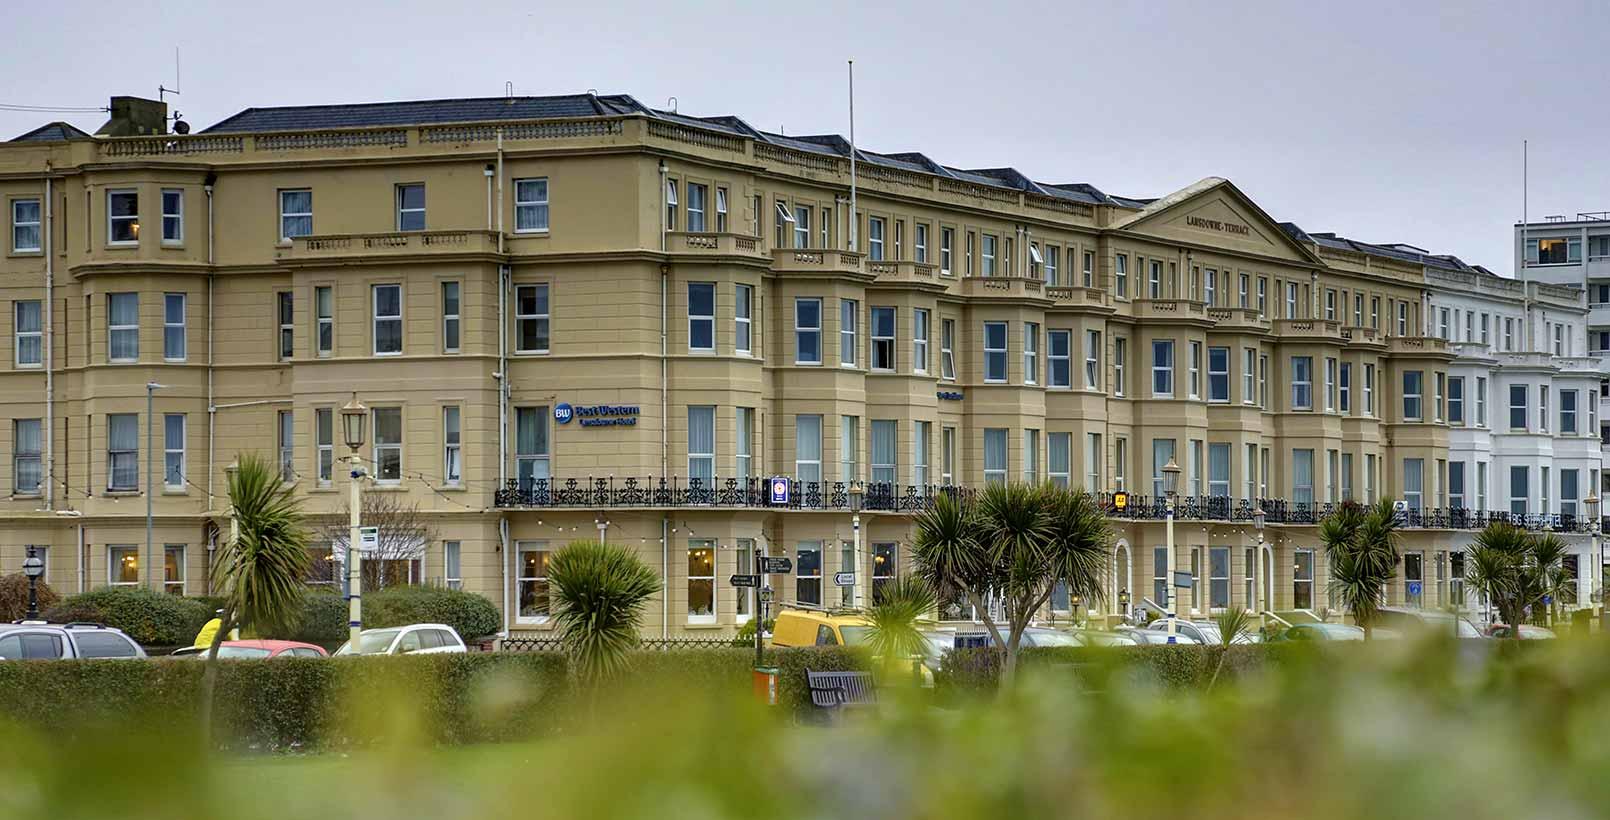 Best Western Lansdowne Hotel | Hotels in Eastbourne, East Sussex